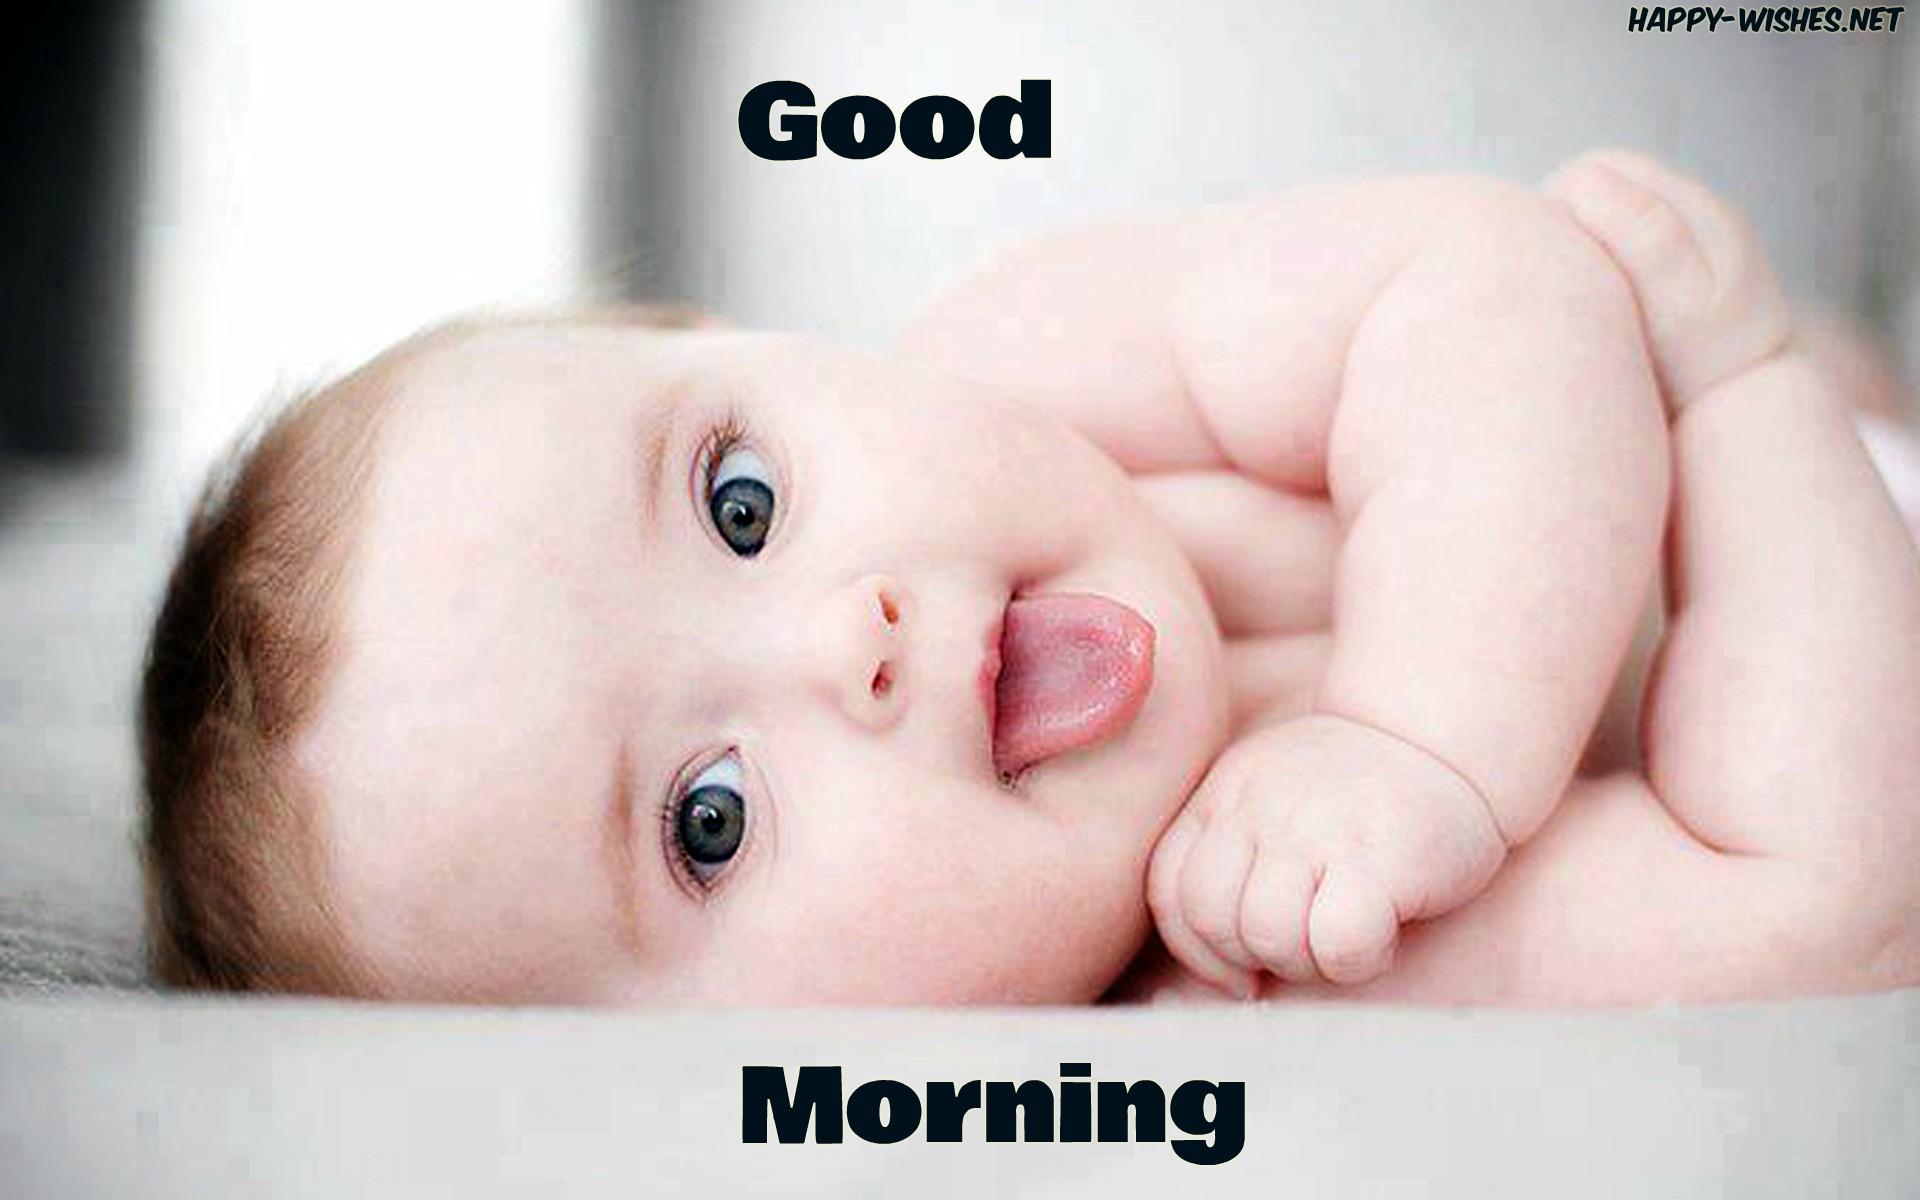 Good morning LITTLE BOY IMAGES